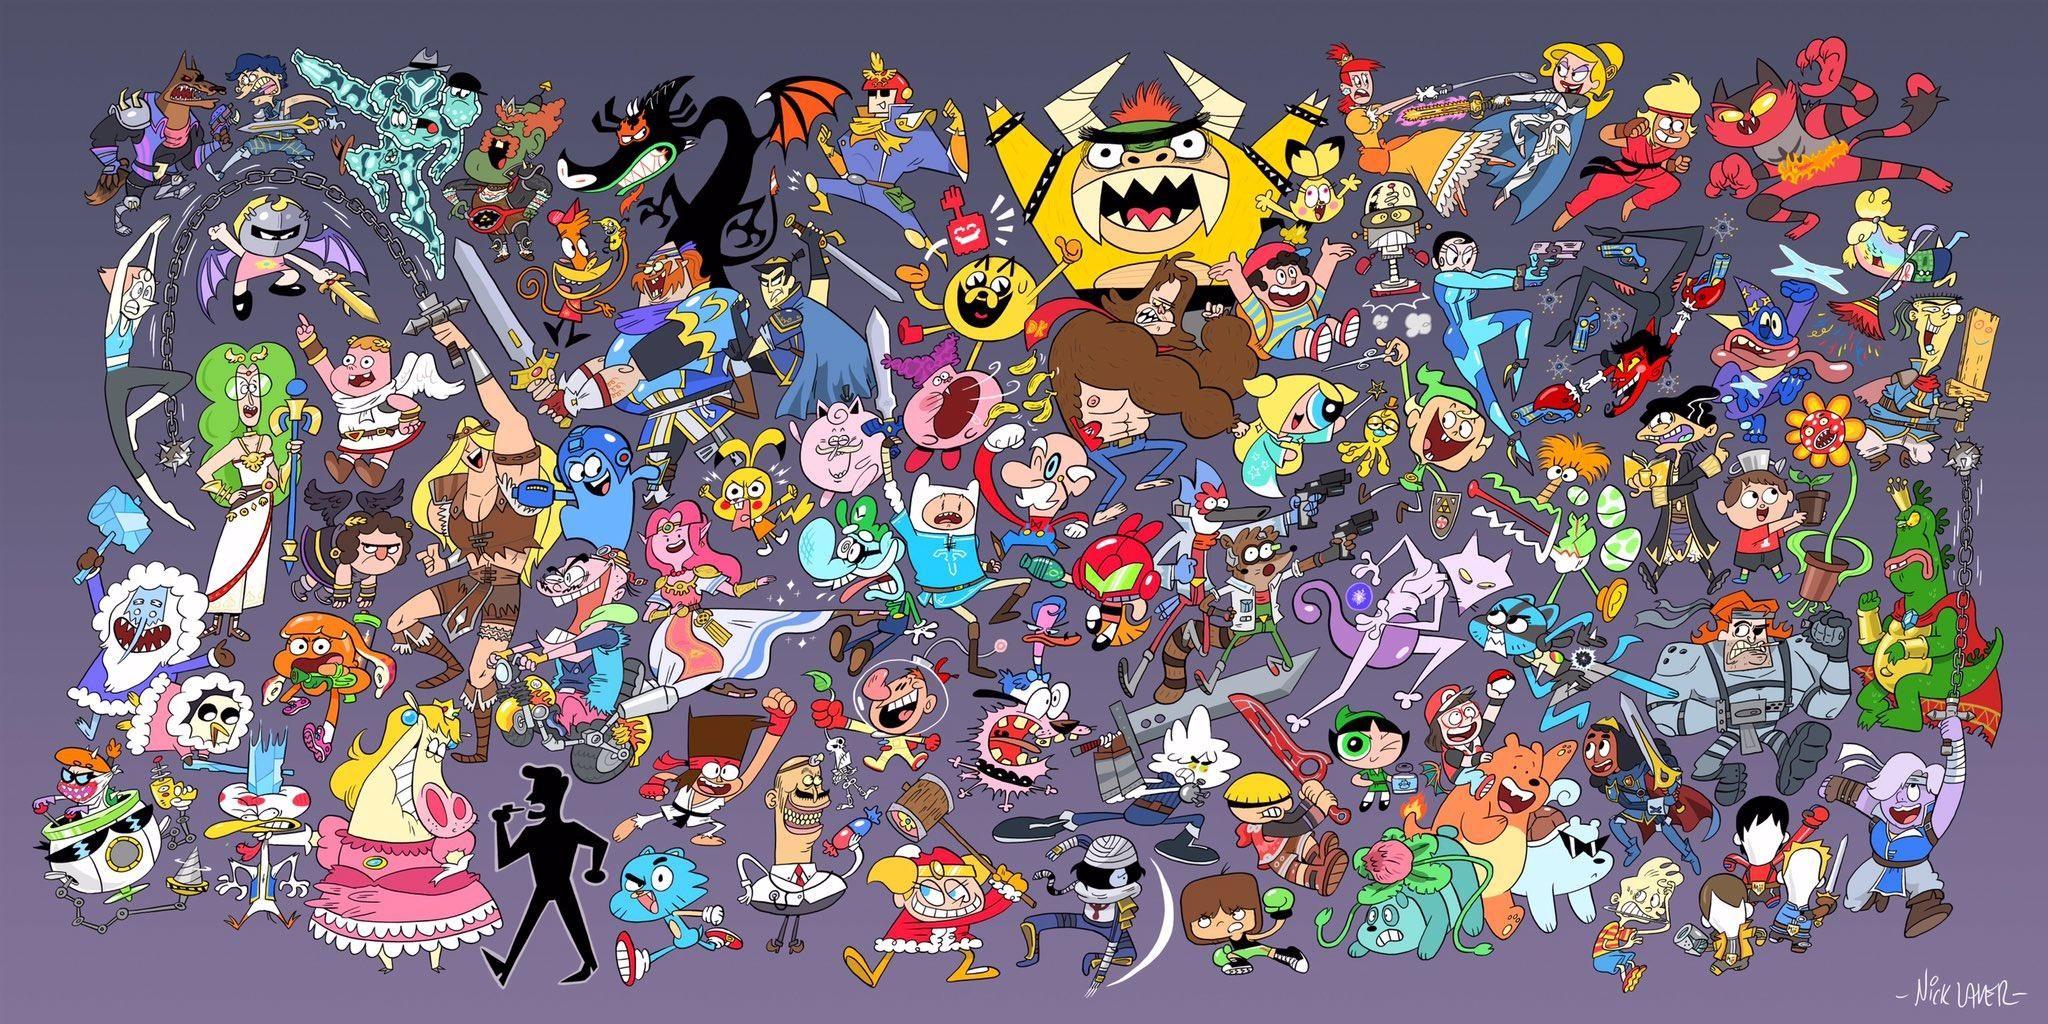 Cartoon Network x Smash | Gaming | Super smash bros, Super